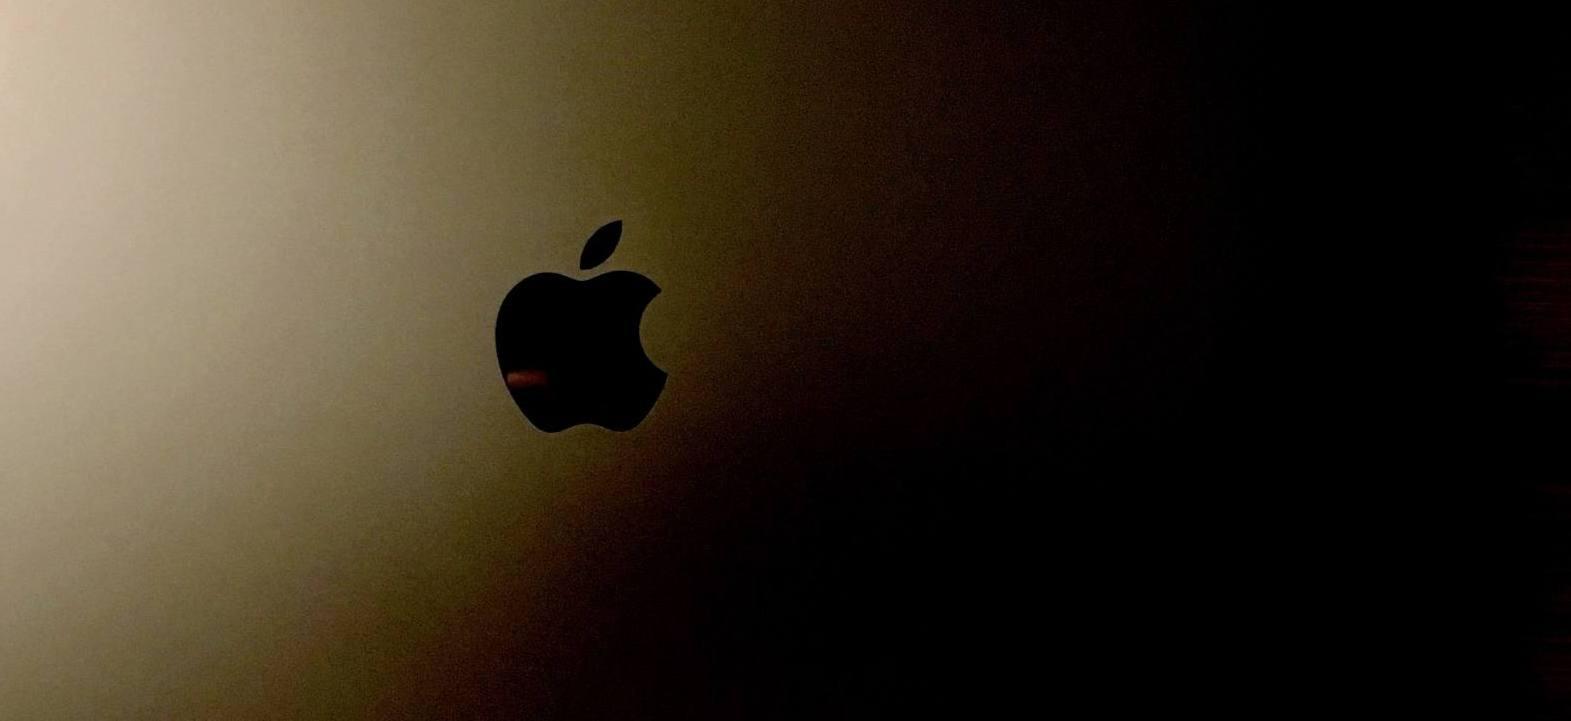 Macbook Air im Praxistest (Bild: Tutonaut)